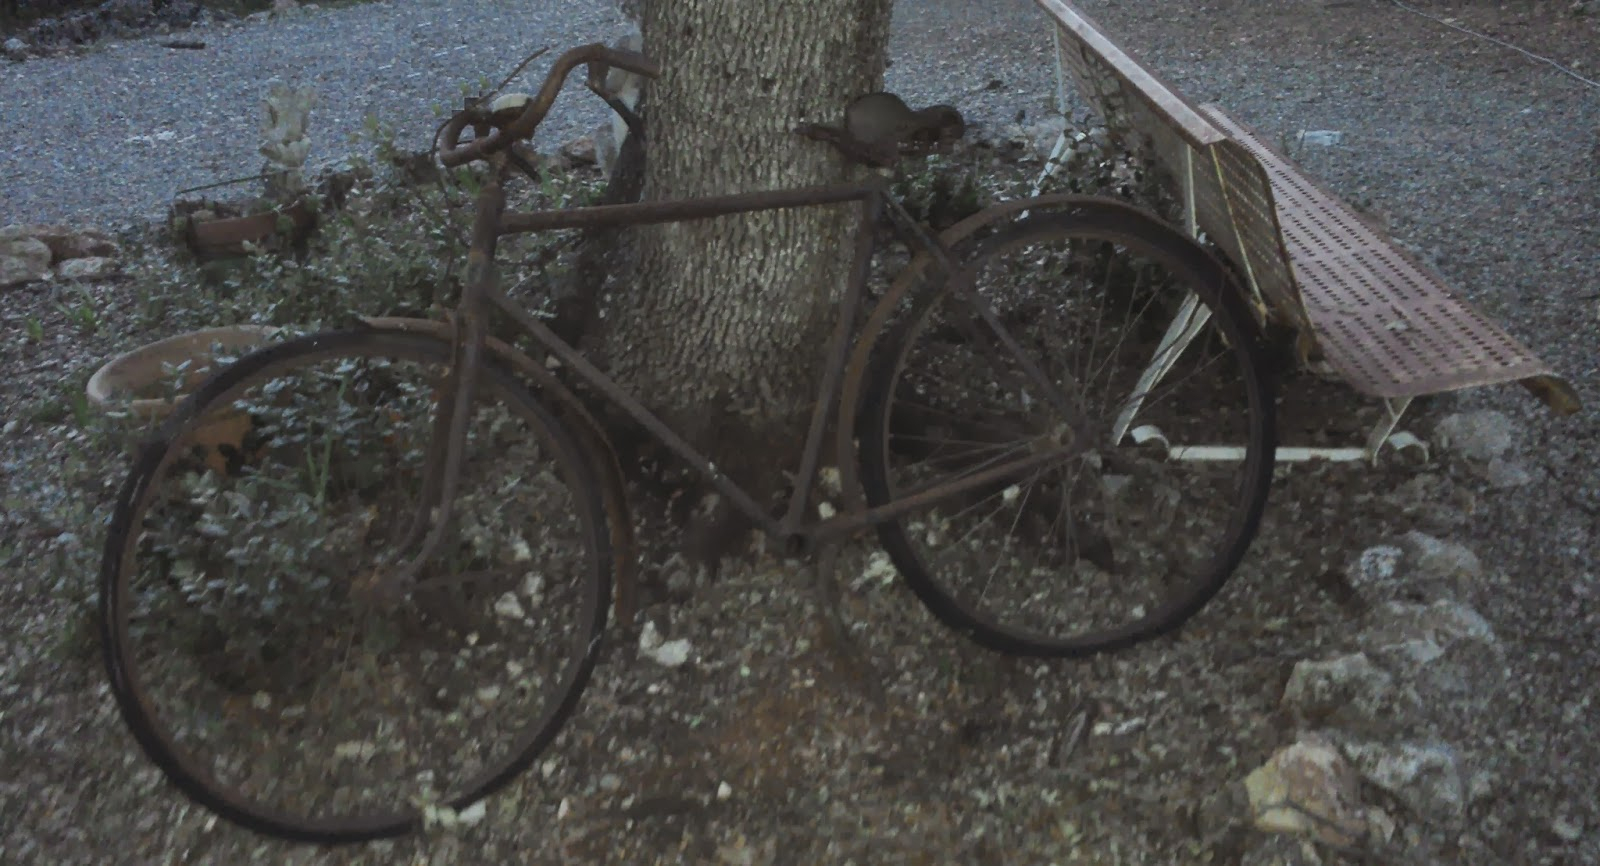 Le Vide Grenier De Didou La Brocante: Ancien Vélo Tout ... dedans Velo Deco Jardin